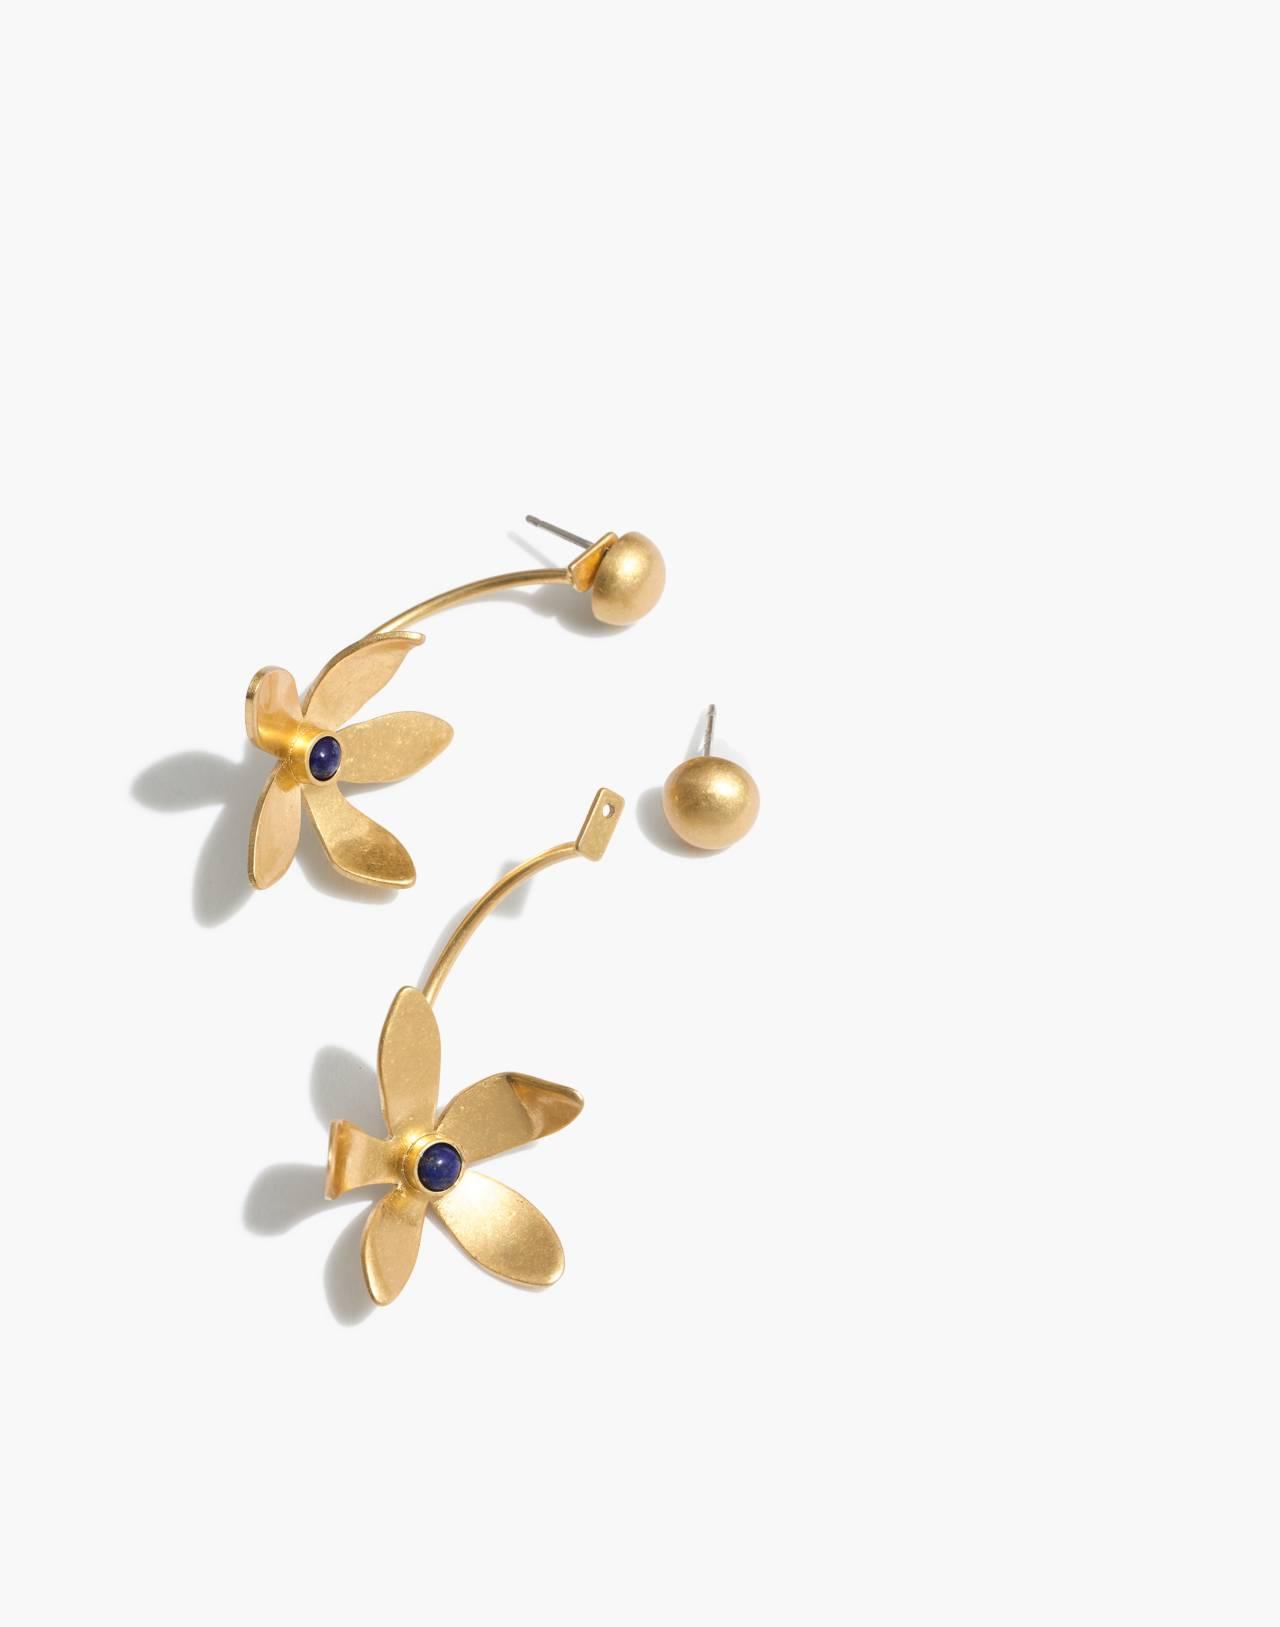 Petalstem Statement Earrings in vintage gold image 1